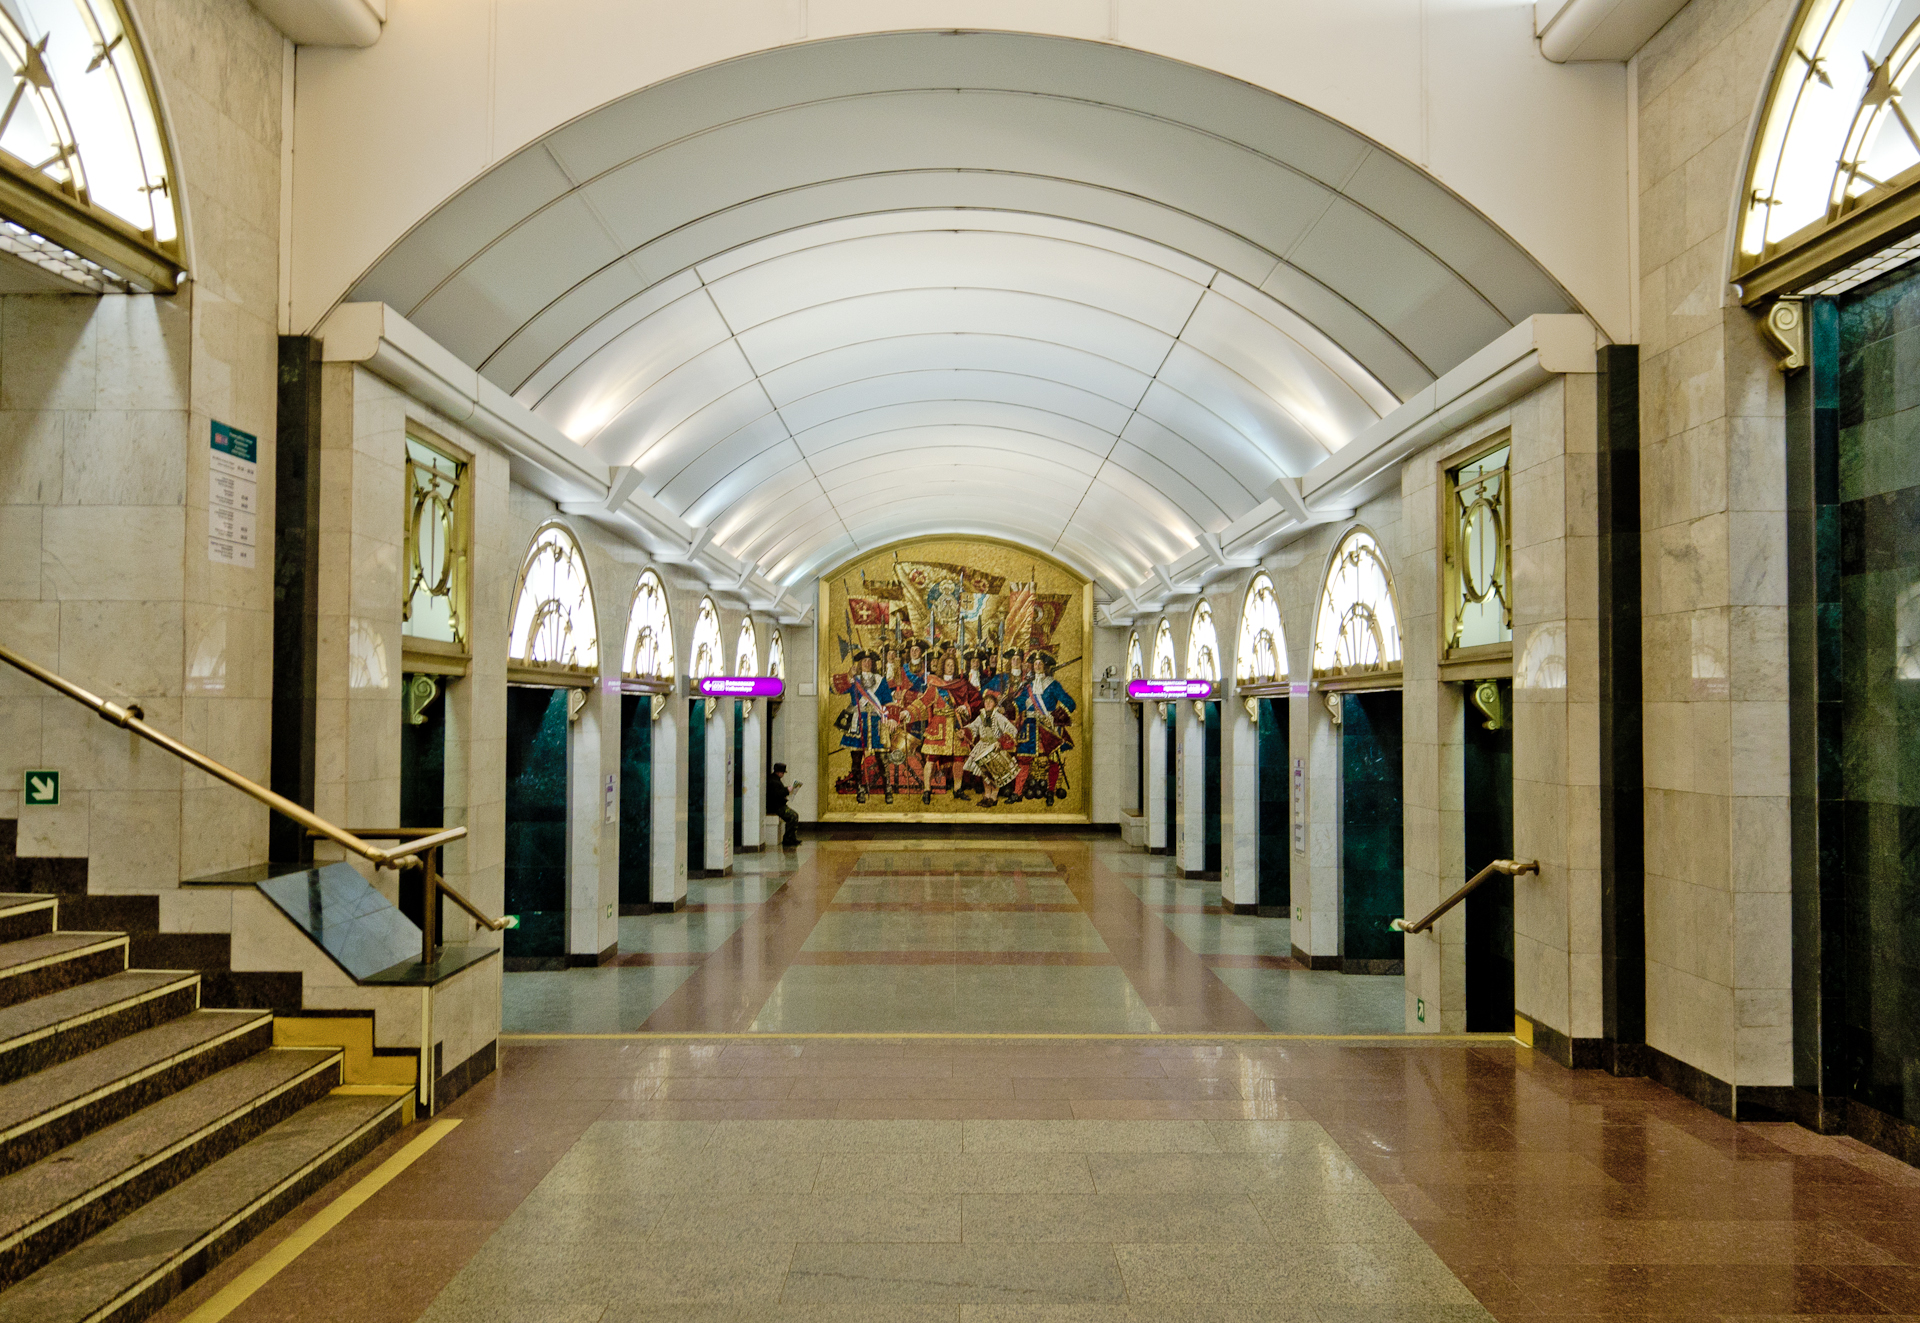 http://img2.wikia.nocookie.net/__cb20141226103314/science/ru/images/f/f5/Metro_SPB_Line5_Zvenigorodskaya.jpg